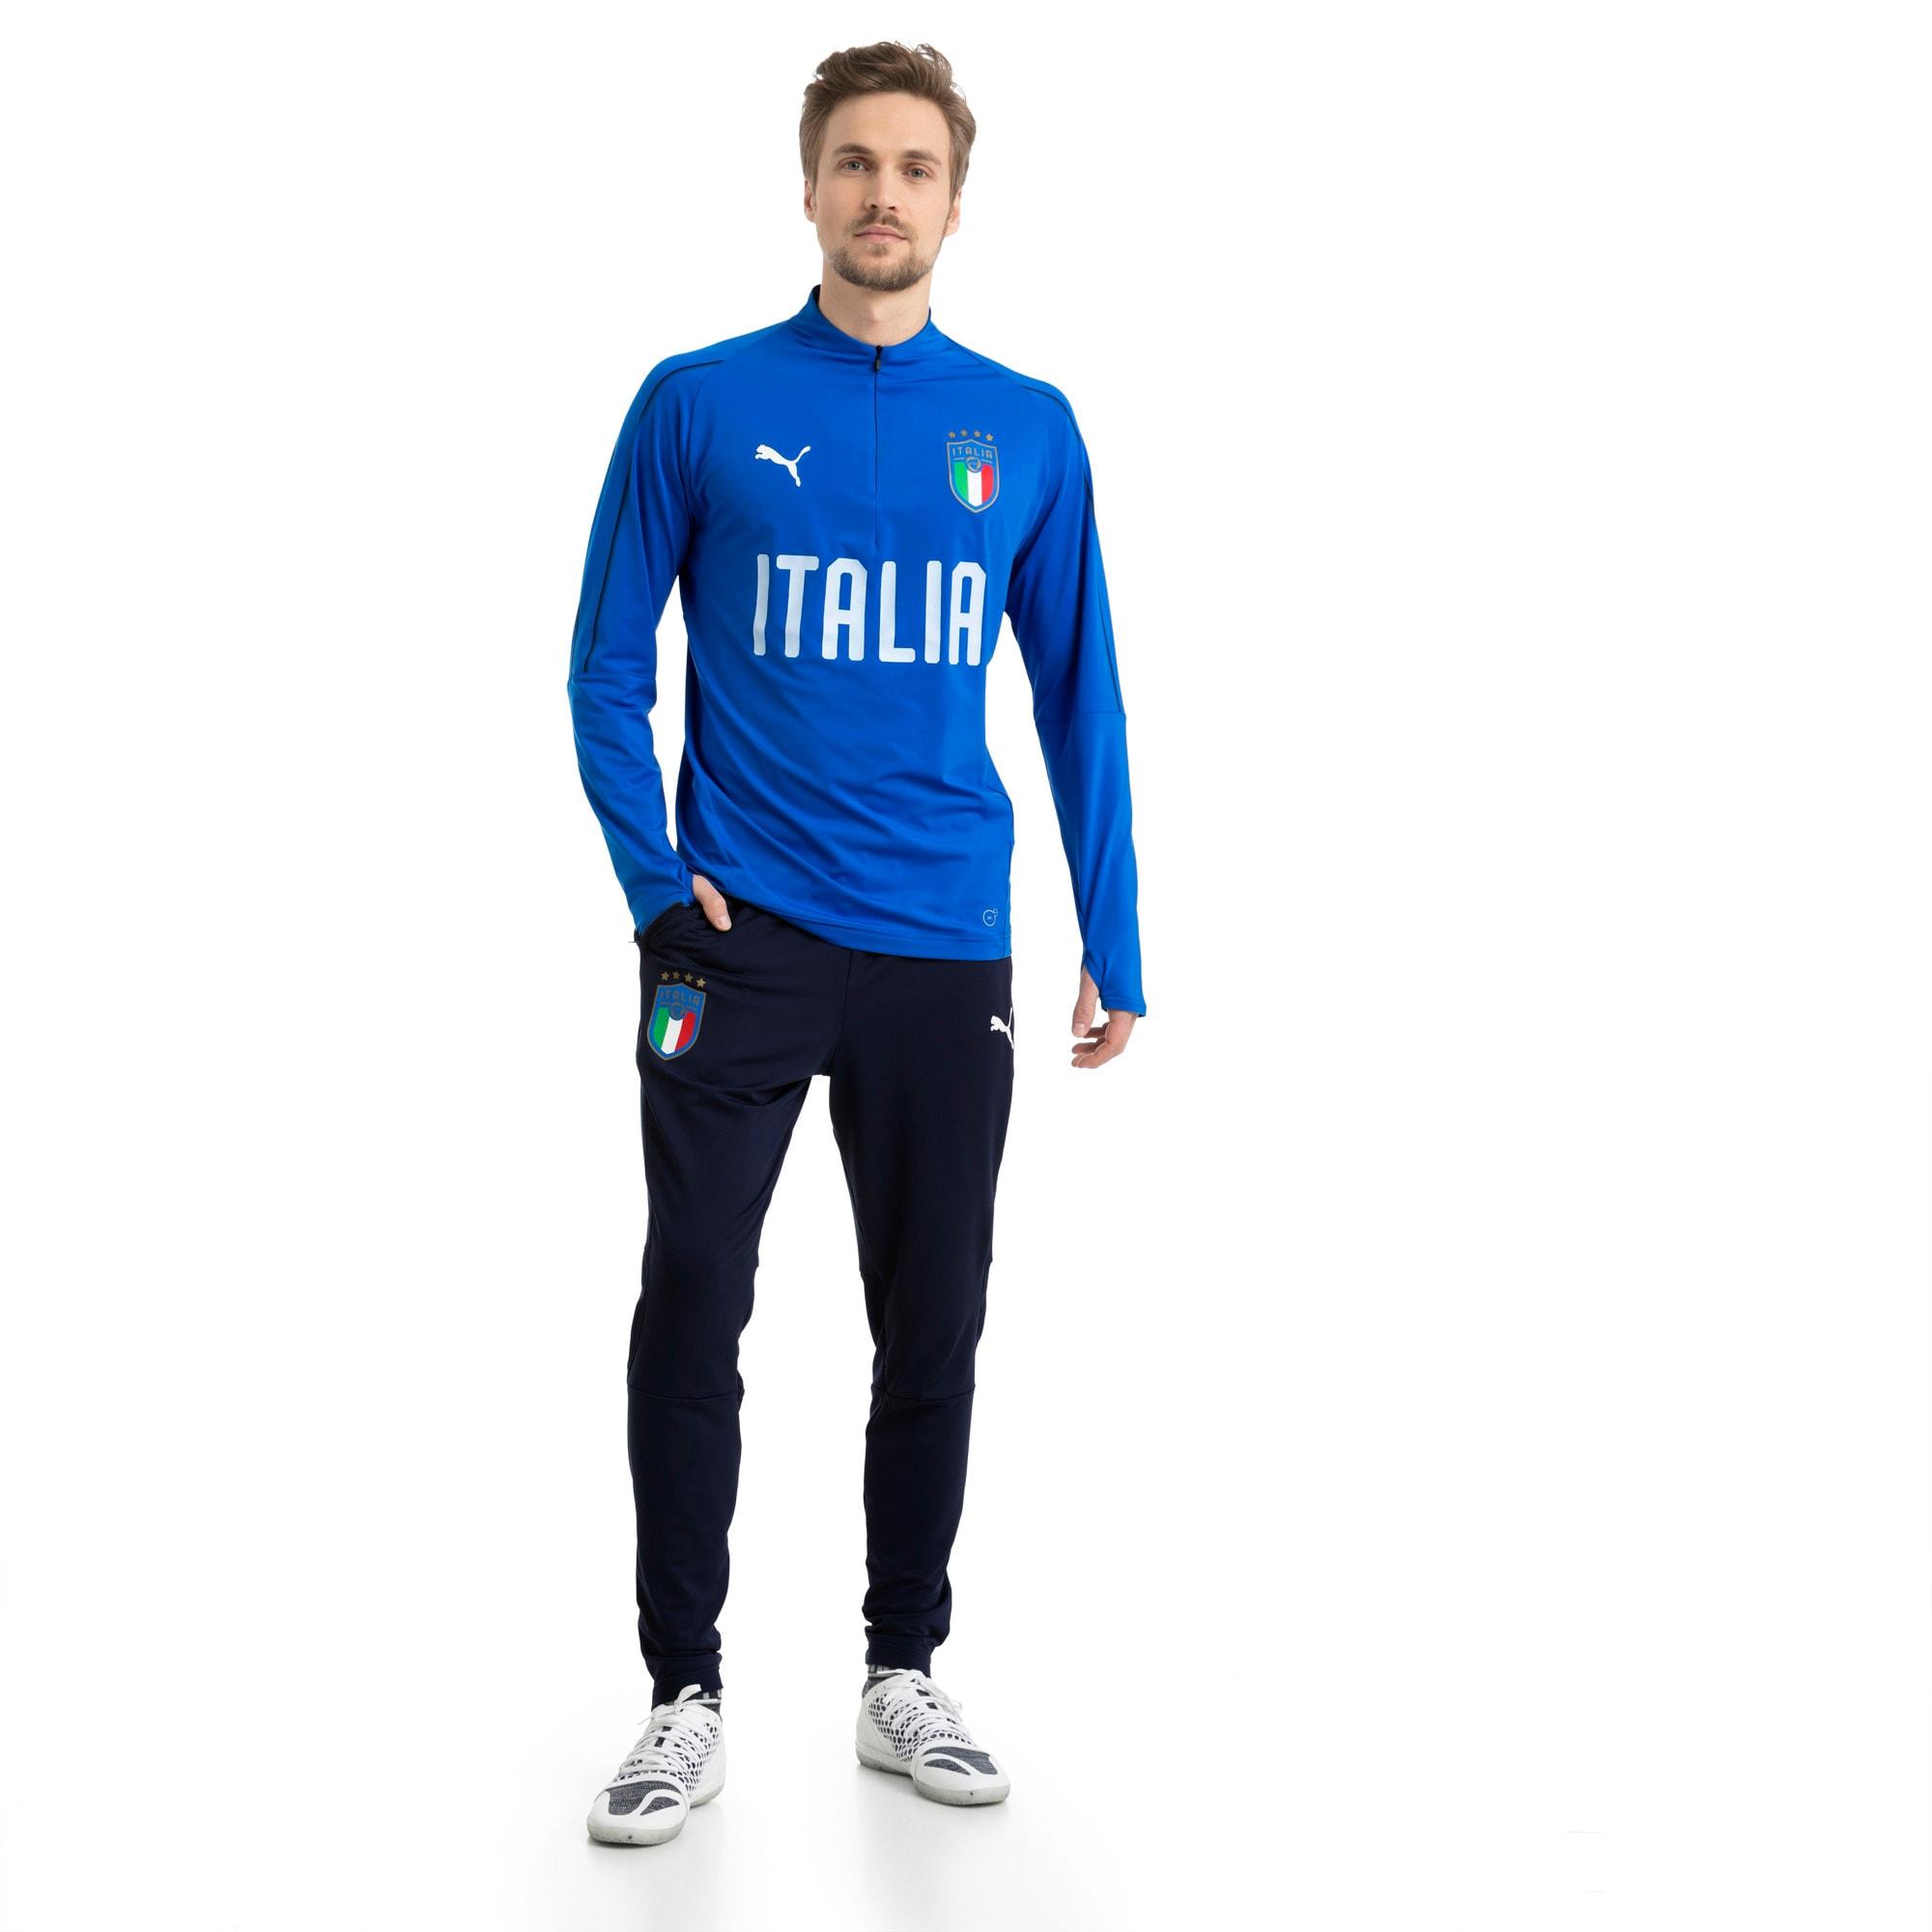 Thumbnail 5 of Italia 1/4 Zip Training Top, Team Power Blue-White, medium